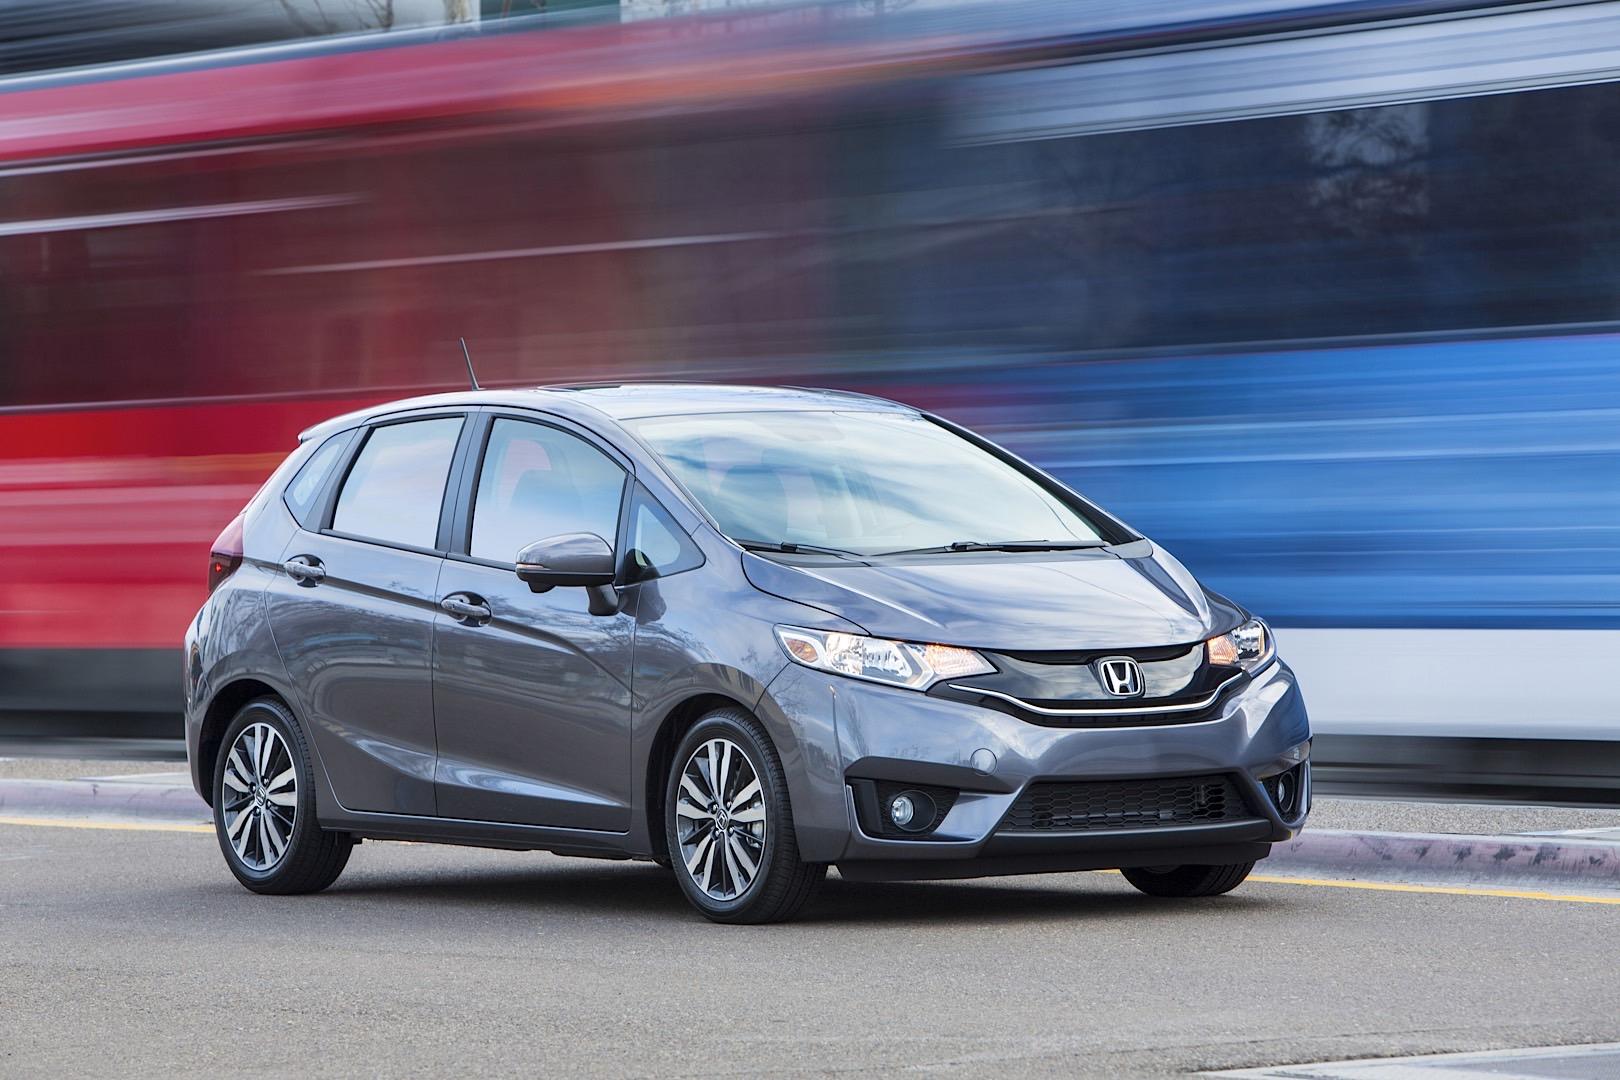 Honda fit car sticker design - For 2016